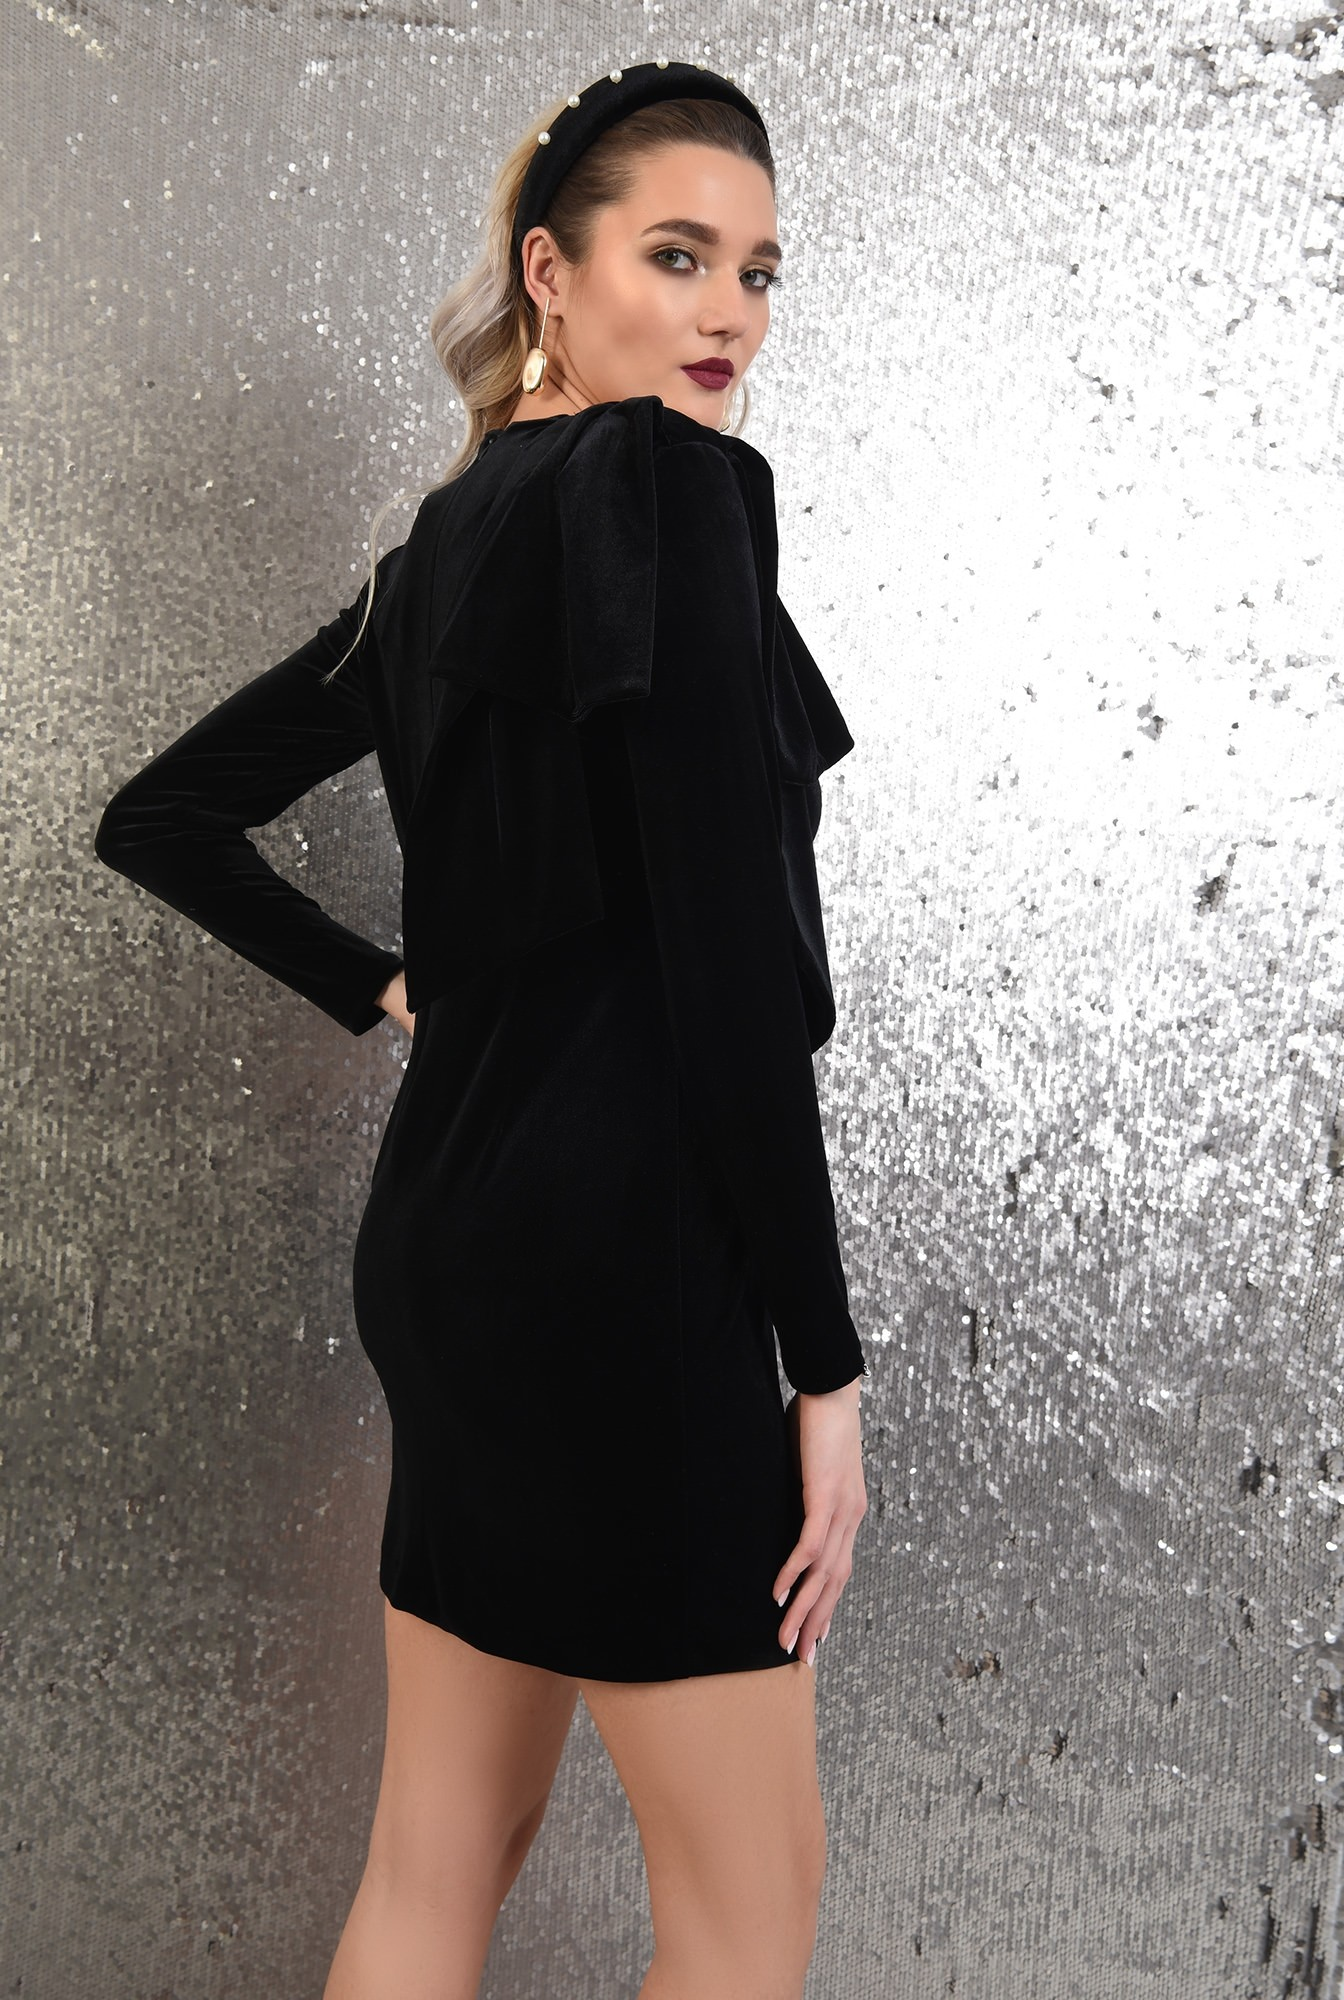 1 -  rochie neagra, scurta, eleganta, din catifea, Poema